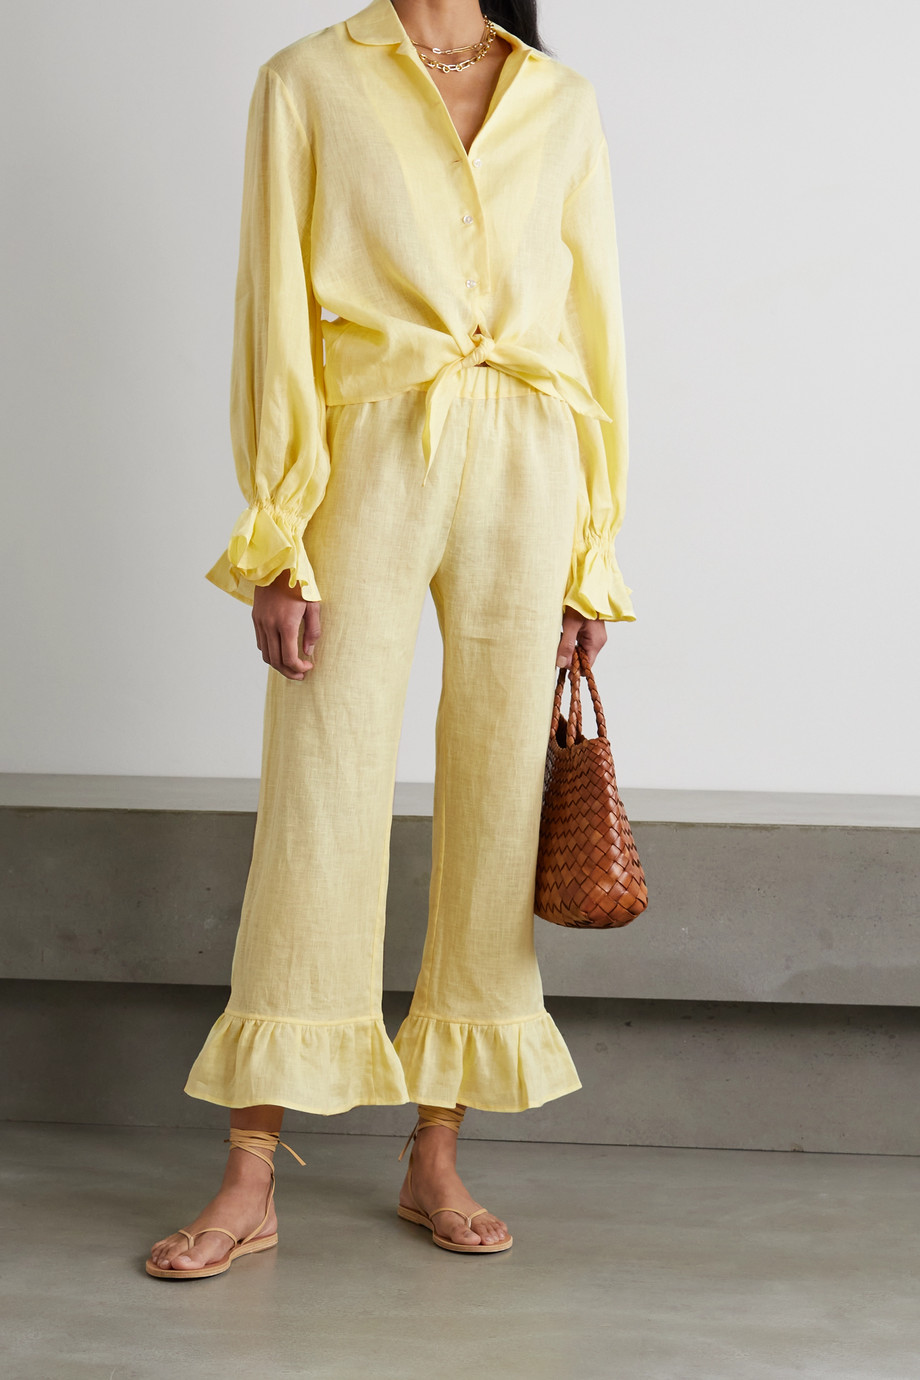 Sleeper Rumba ruffled linen shirt and pants set